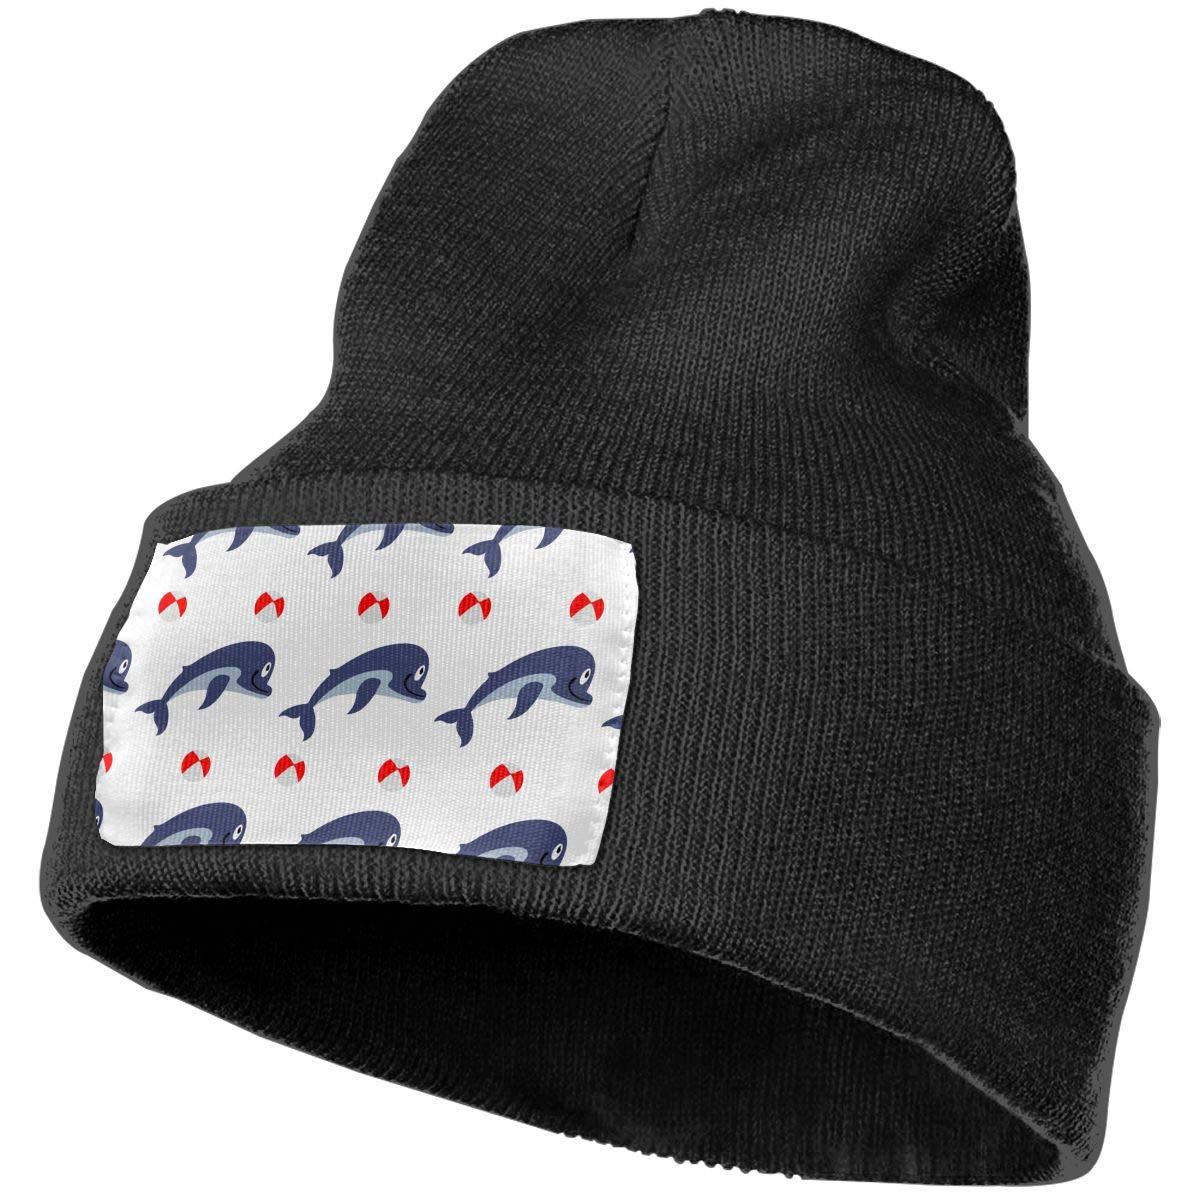 Dolphin with Ball Unisex Winter Knitting Woolen Hat Warm Cap